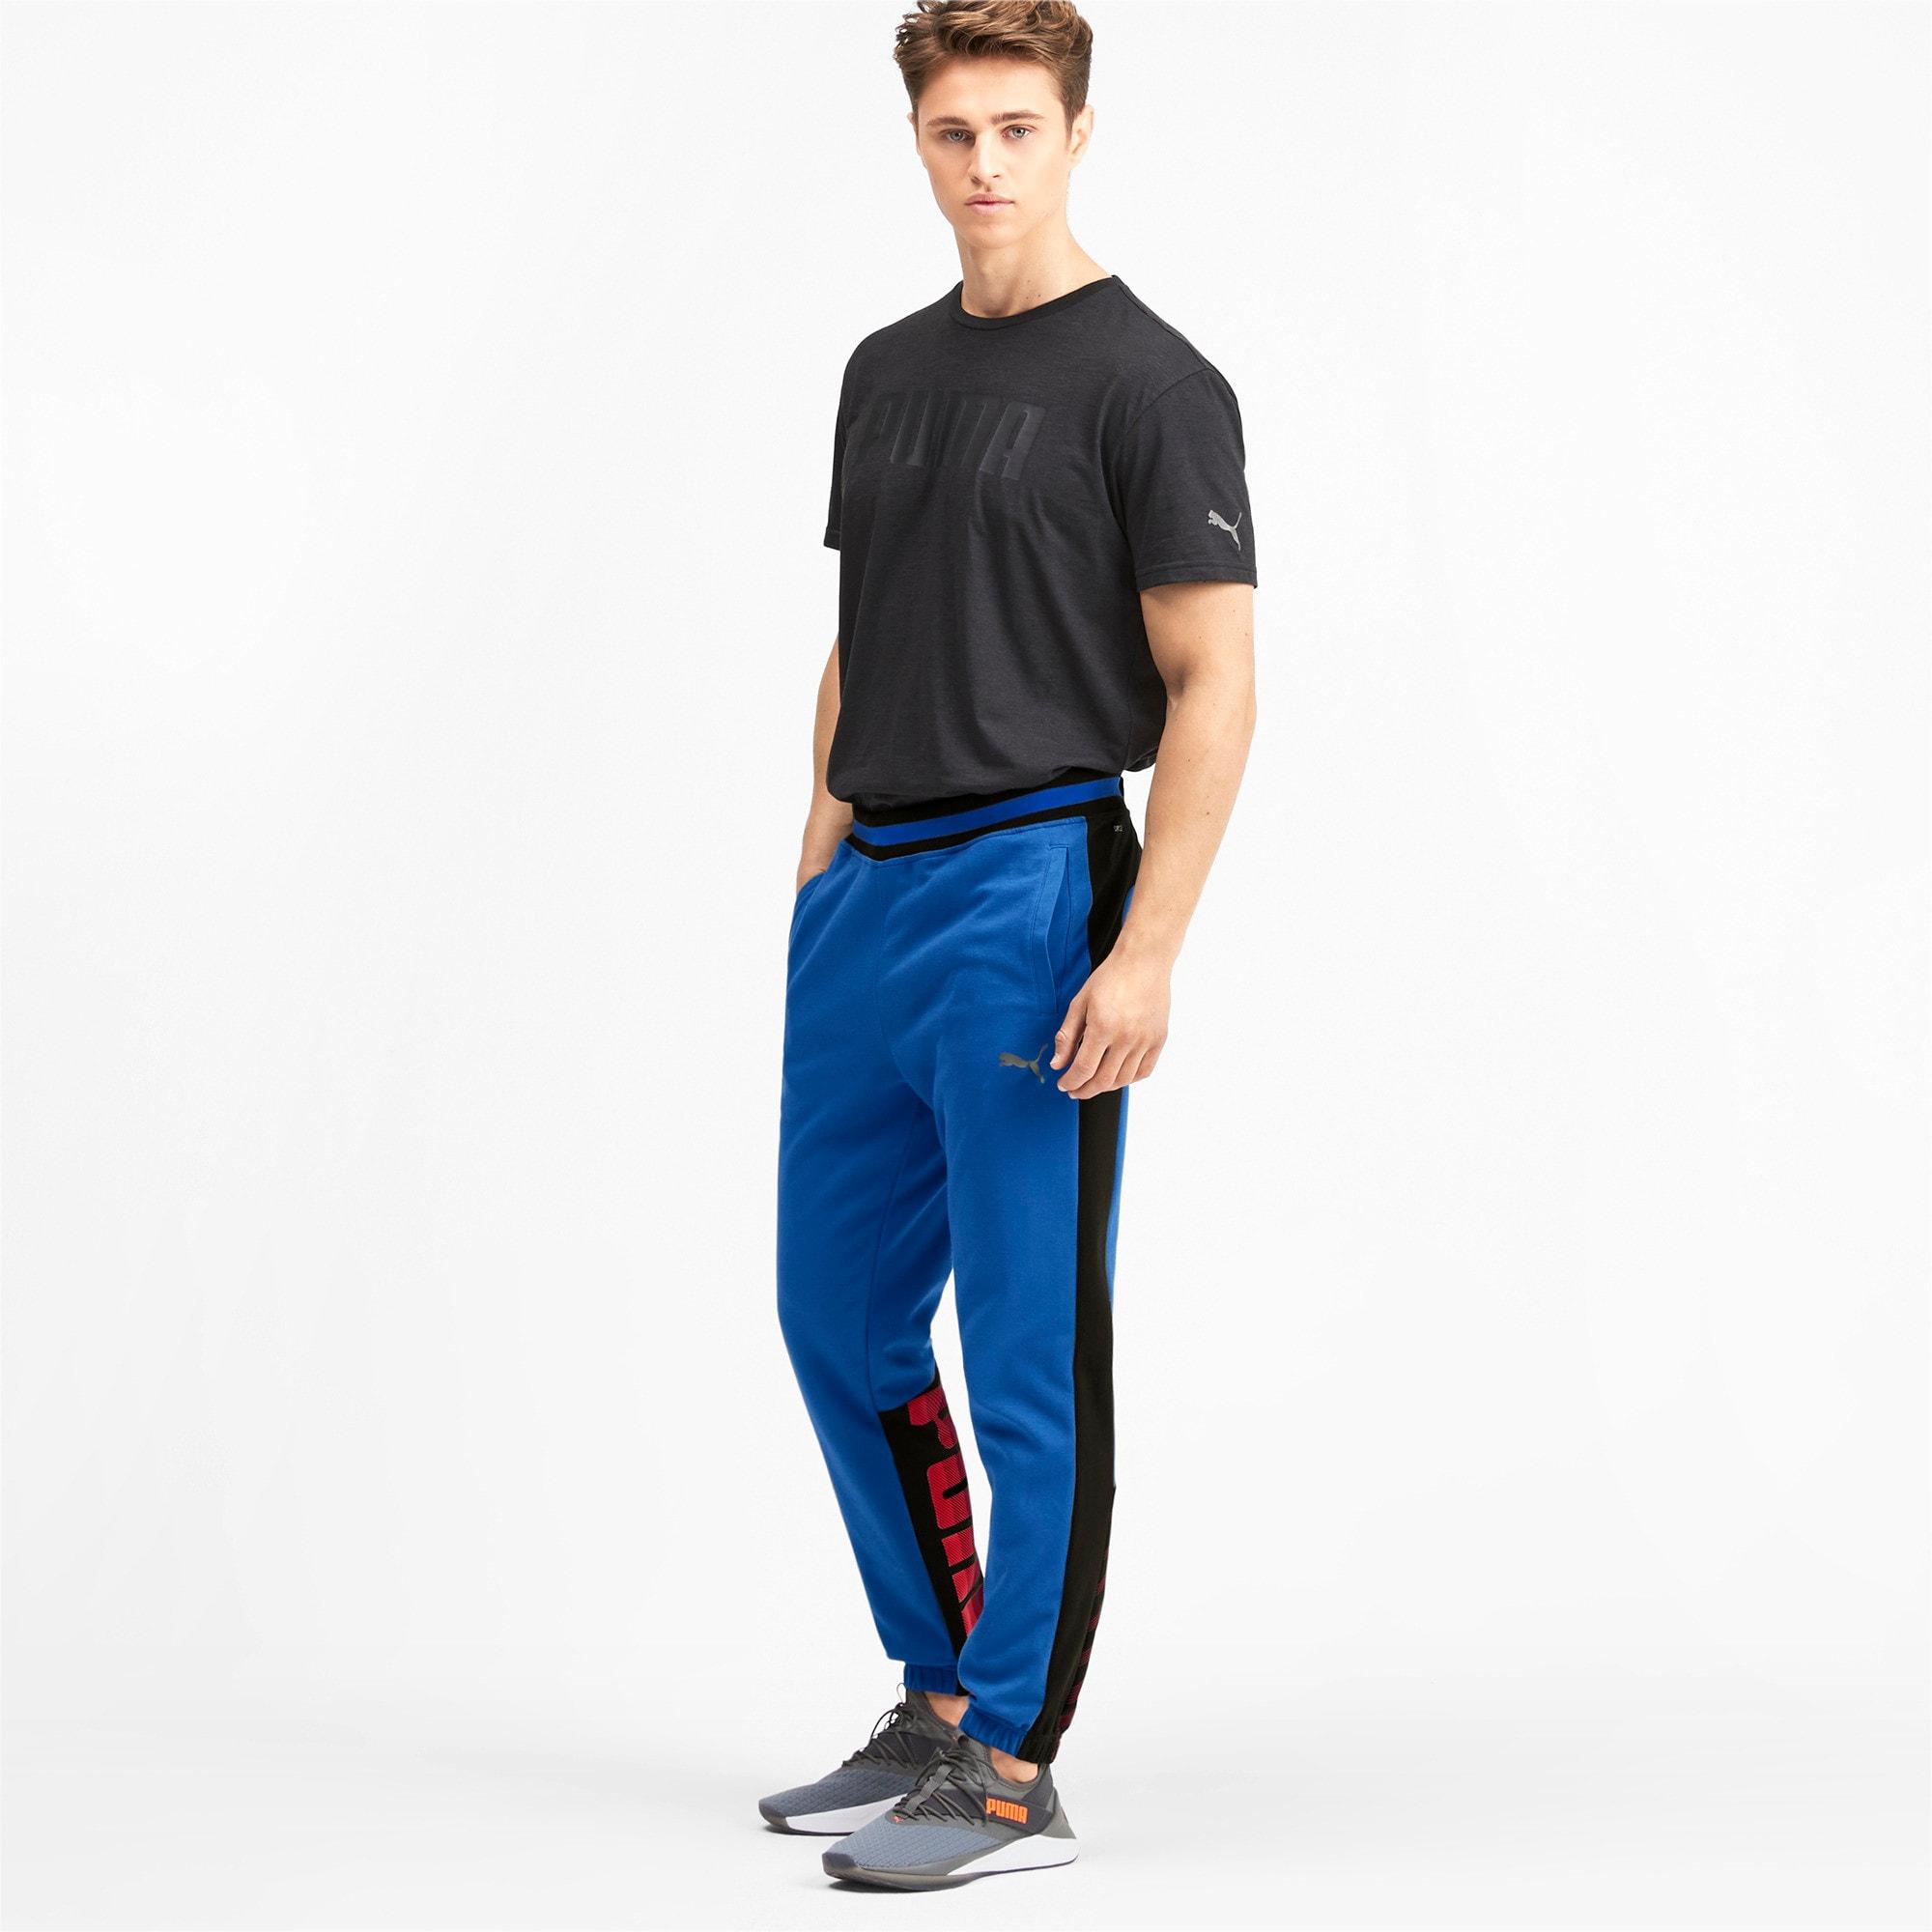 Thumbnail 4 of Collective Men's Sweatpants, Galaxy Blue, medium